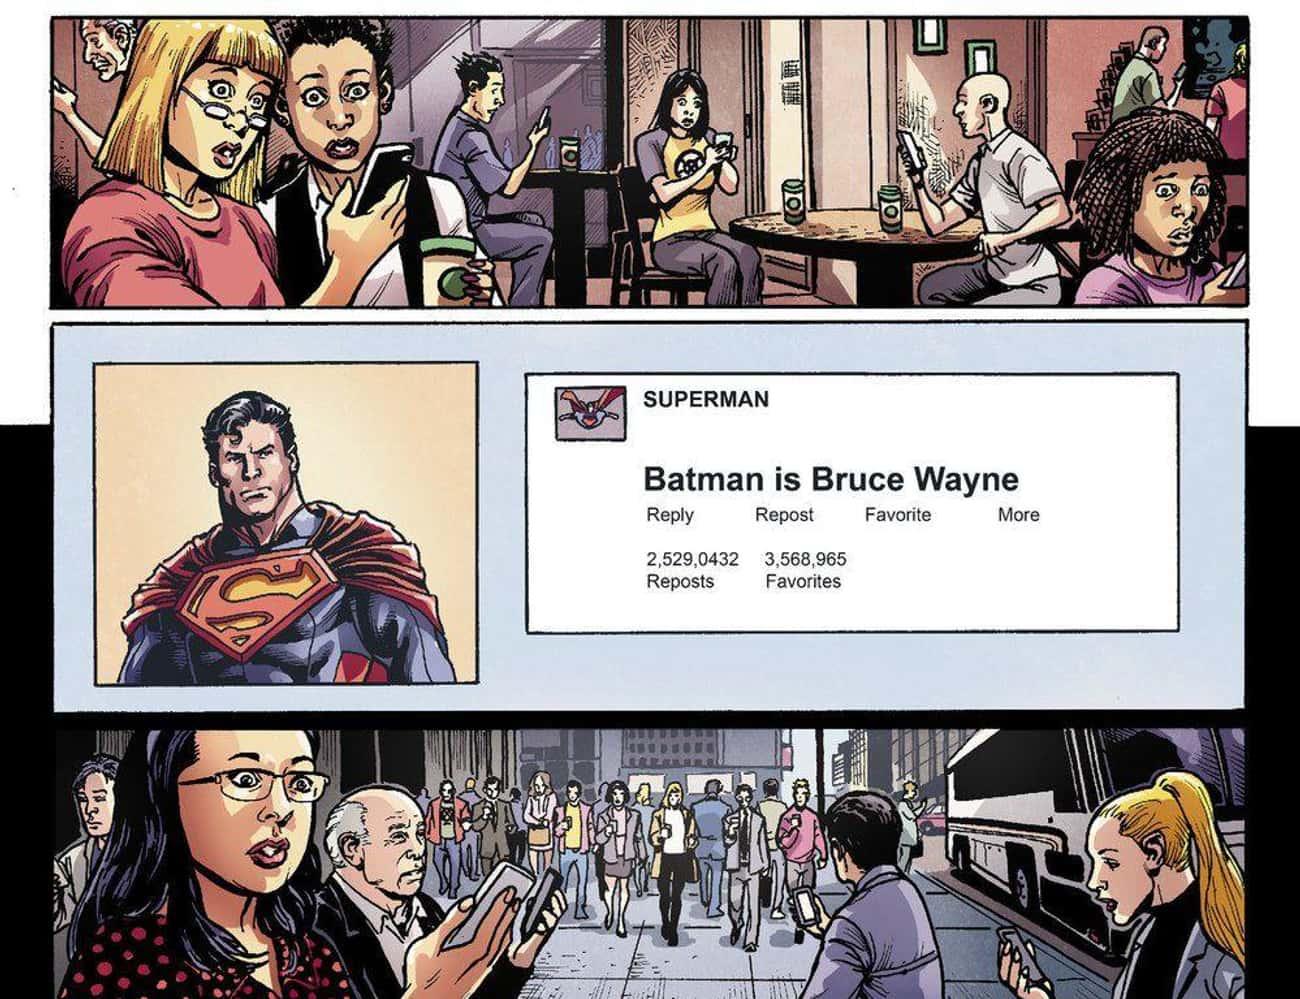 Superman Outs Batman's Secret Identity On Social Media In 'Injustice: Gods Among Us' #10